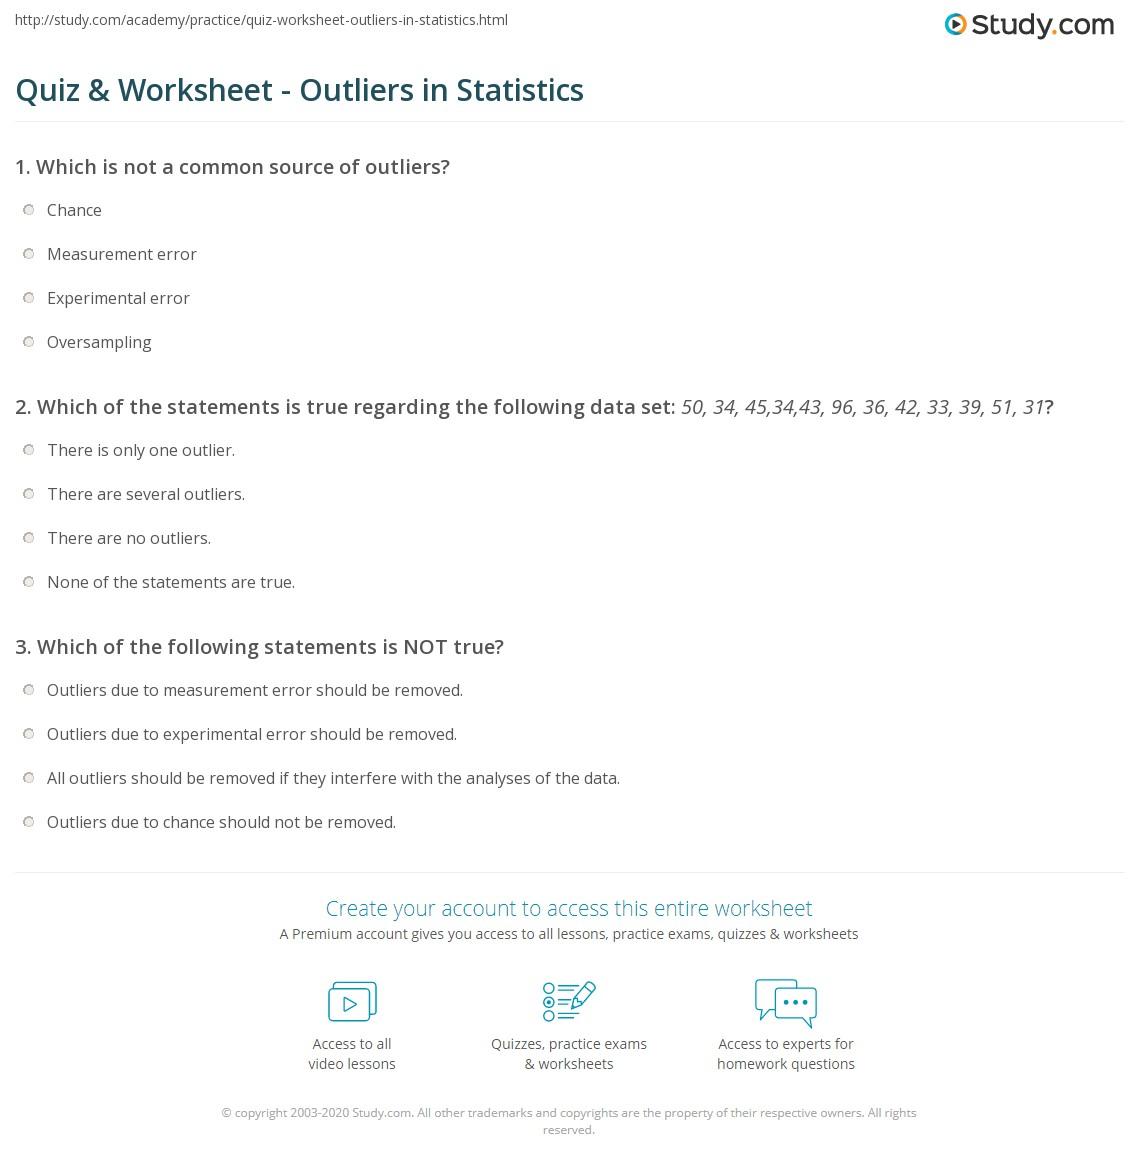 quiz worksheet outliers in statistics. Black Bedroom Furniture Sets. Home Design Ideas